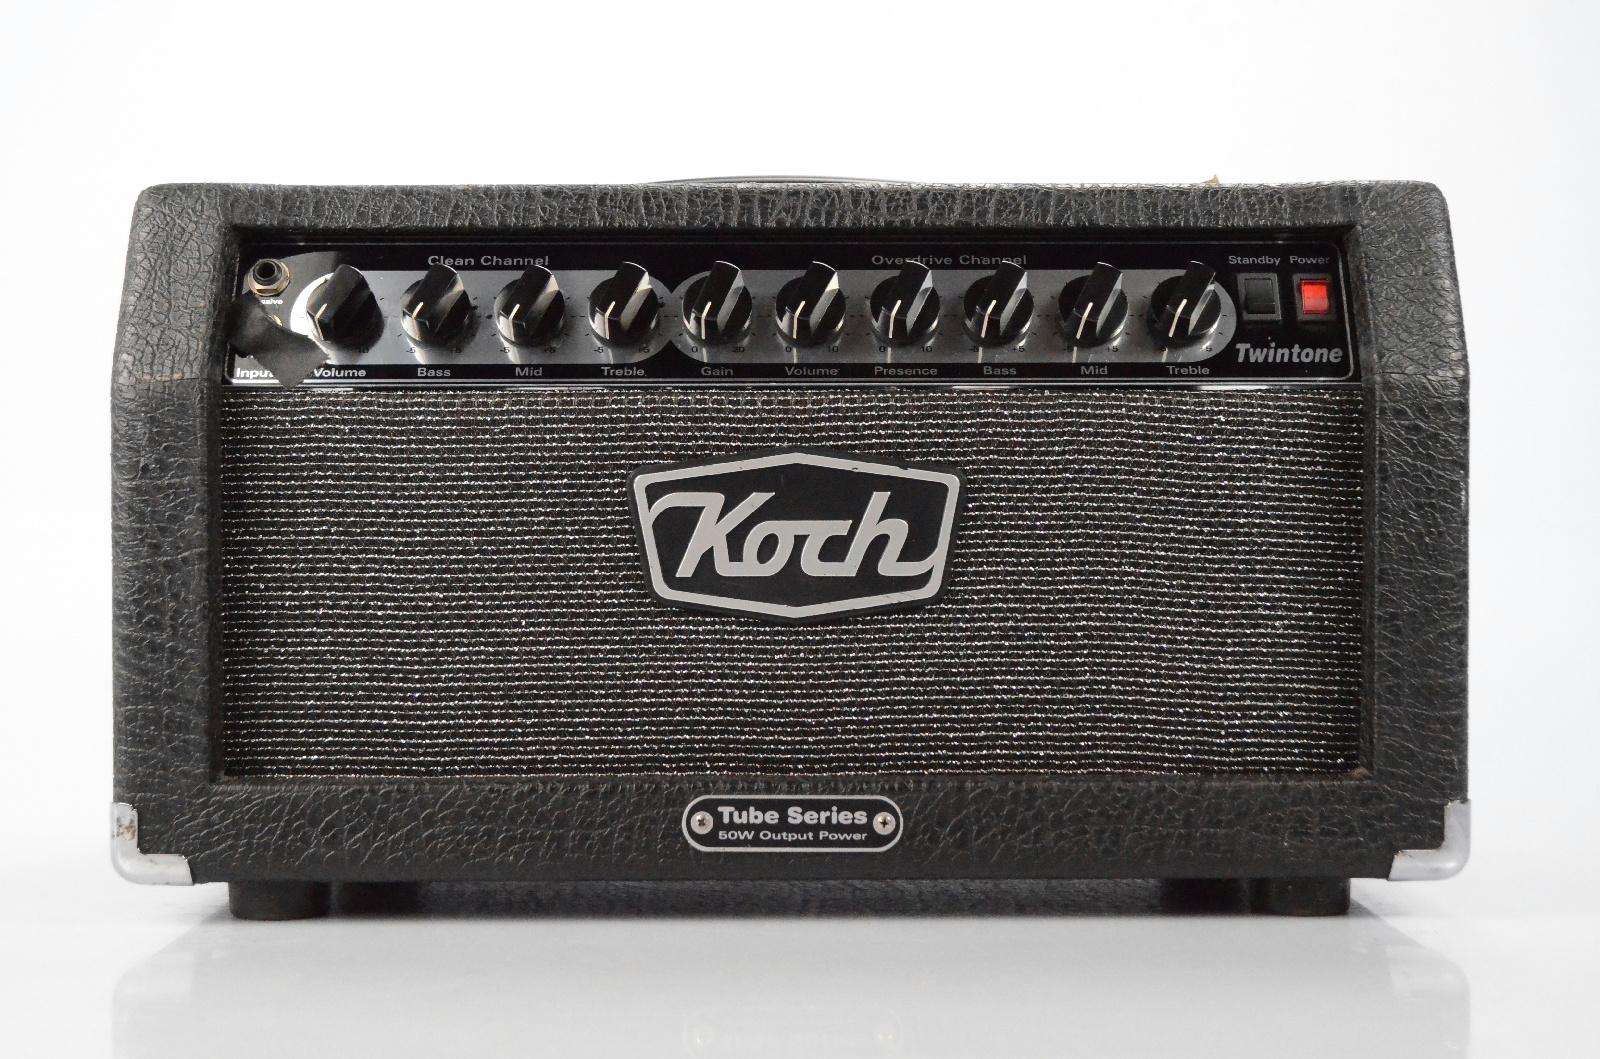 Koch Twintone MK1 Tube Amplifier Amp w/ Upgrades Owned by George Lynch #32472